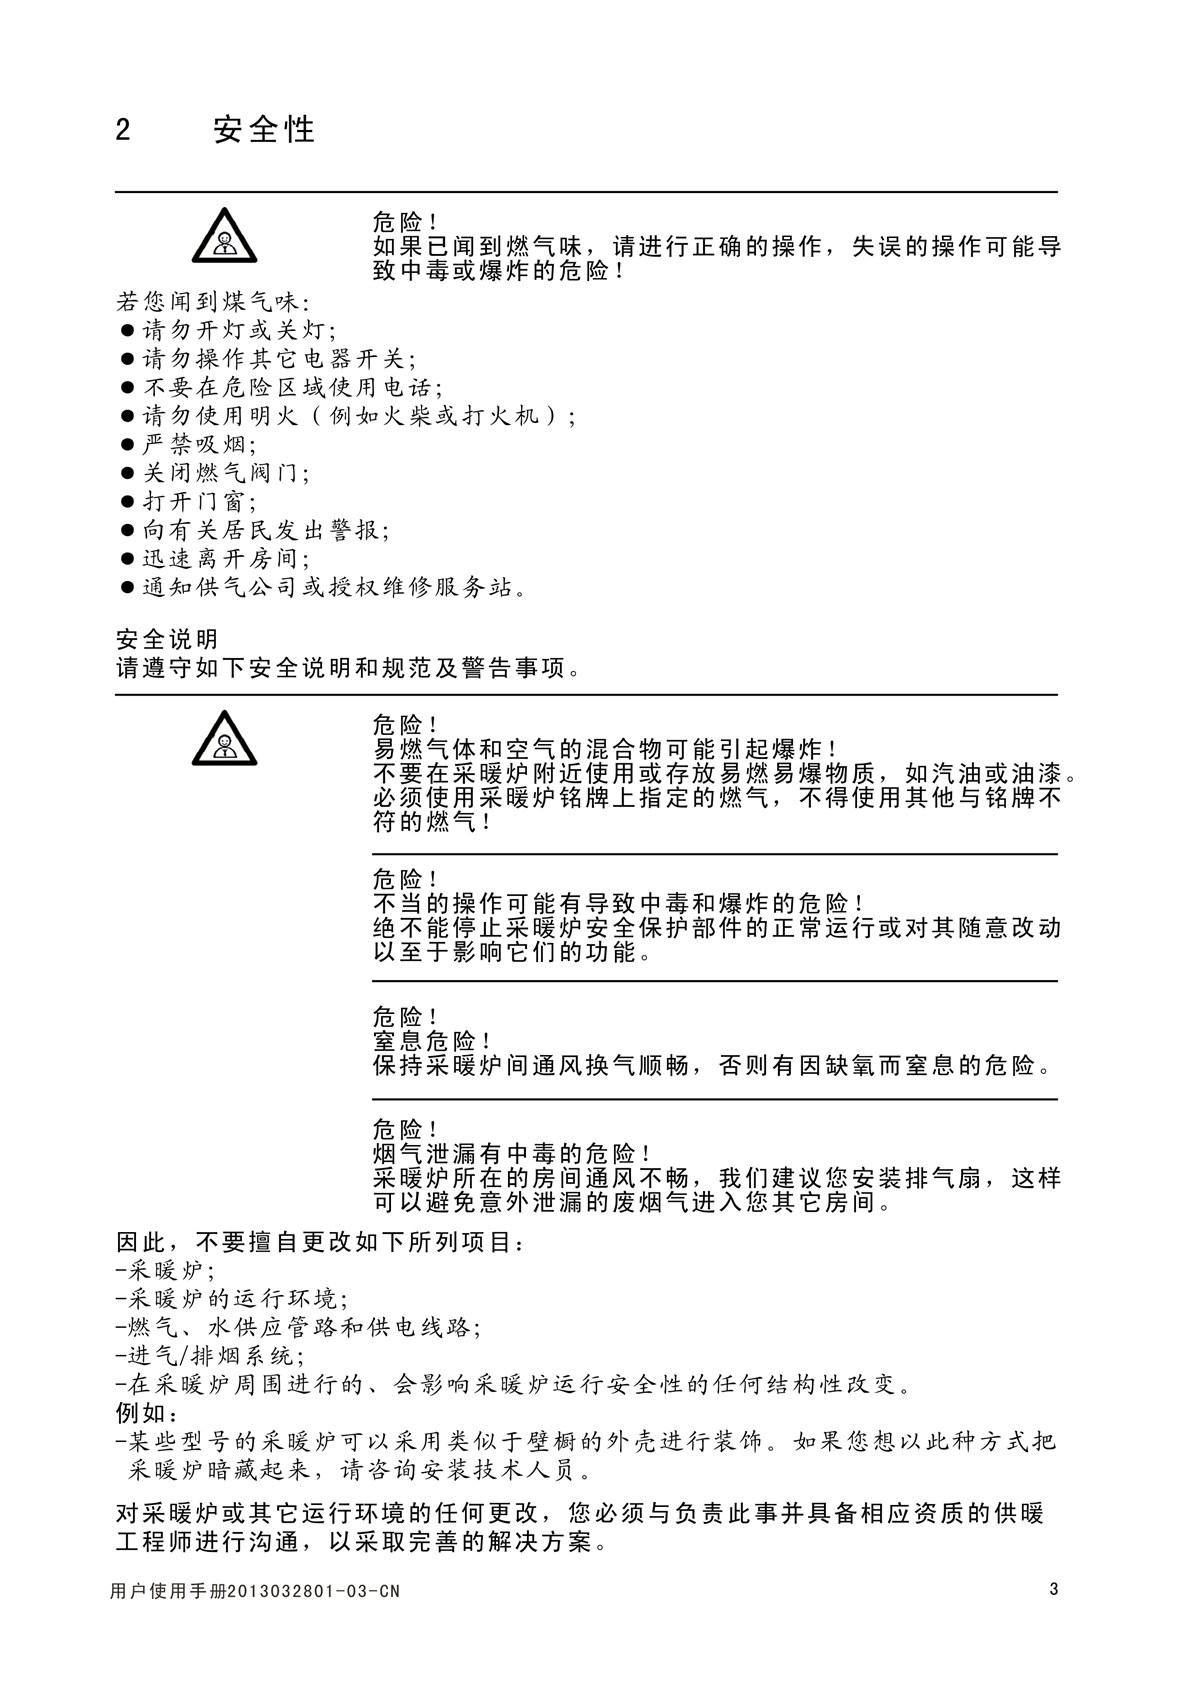 ES16A系列-用户使用手册-4_02.jpg